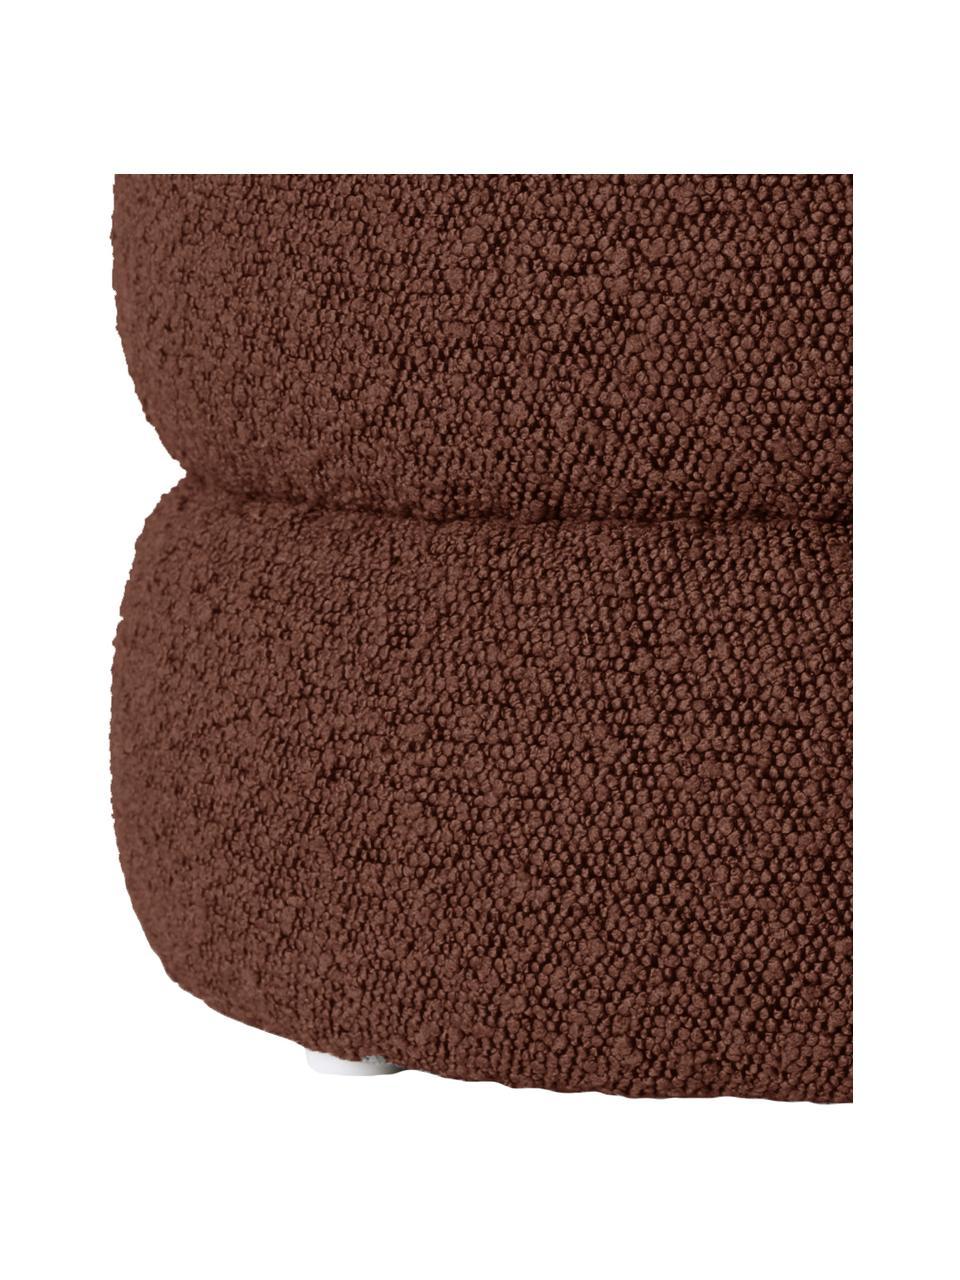 Bouclé-Hocker Alto in Braun, Bezug: Bouclé (100% Polyester) D, Gestell: Massives Kiefernholz, Spe, Bouclé Braun, Ø 42 x H 47 cm